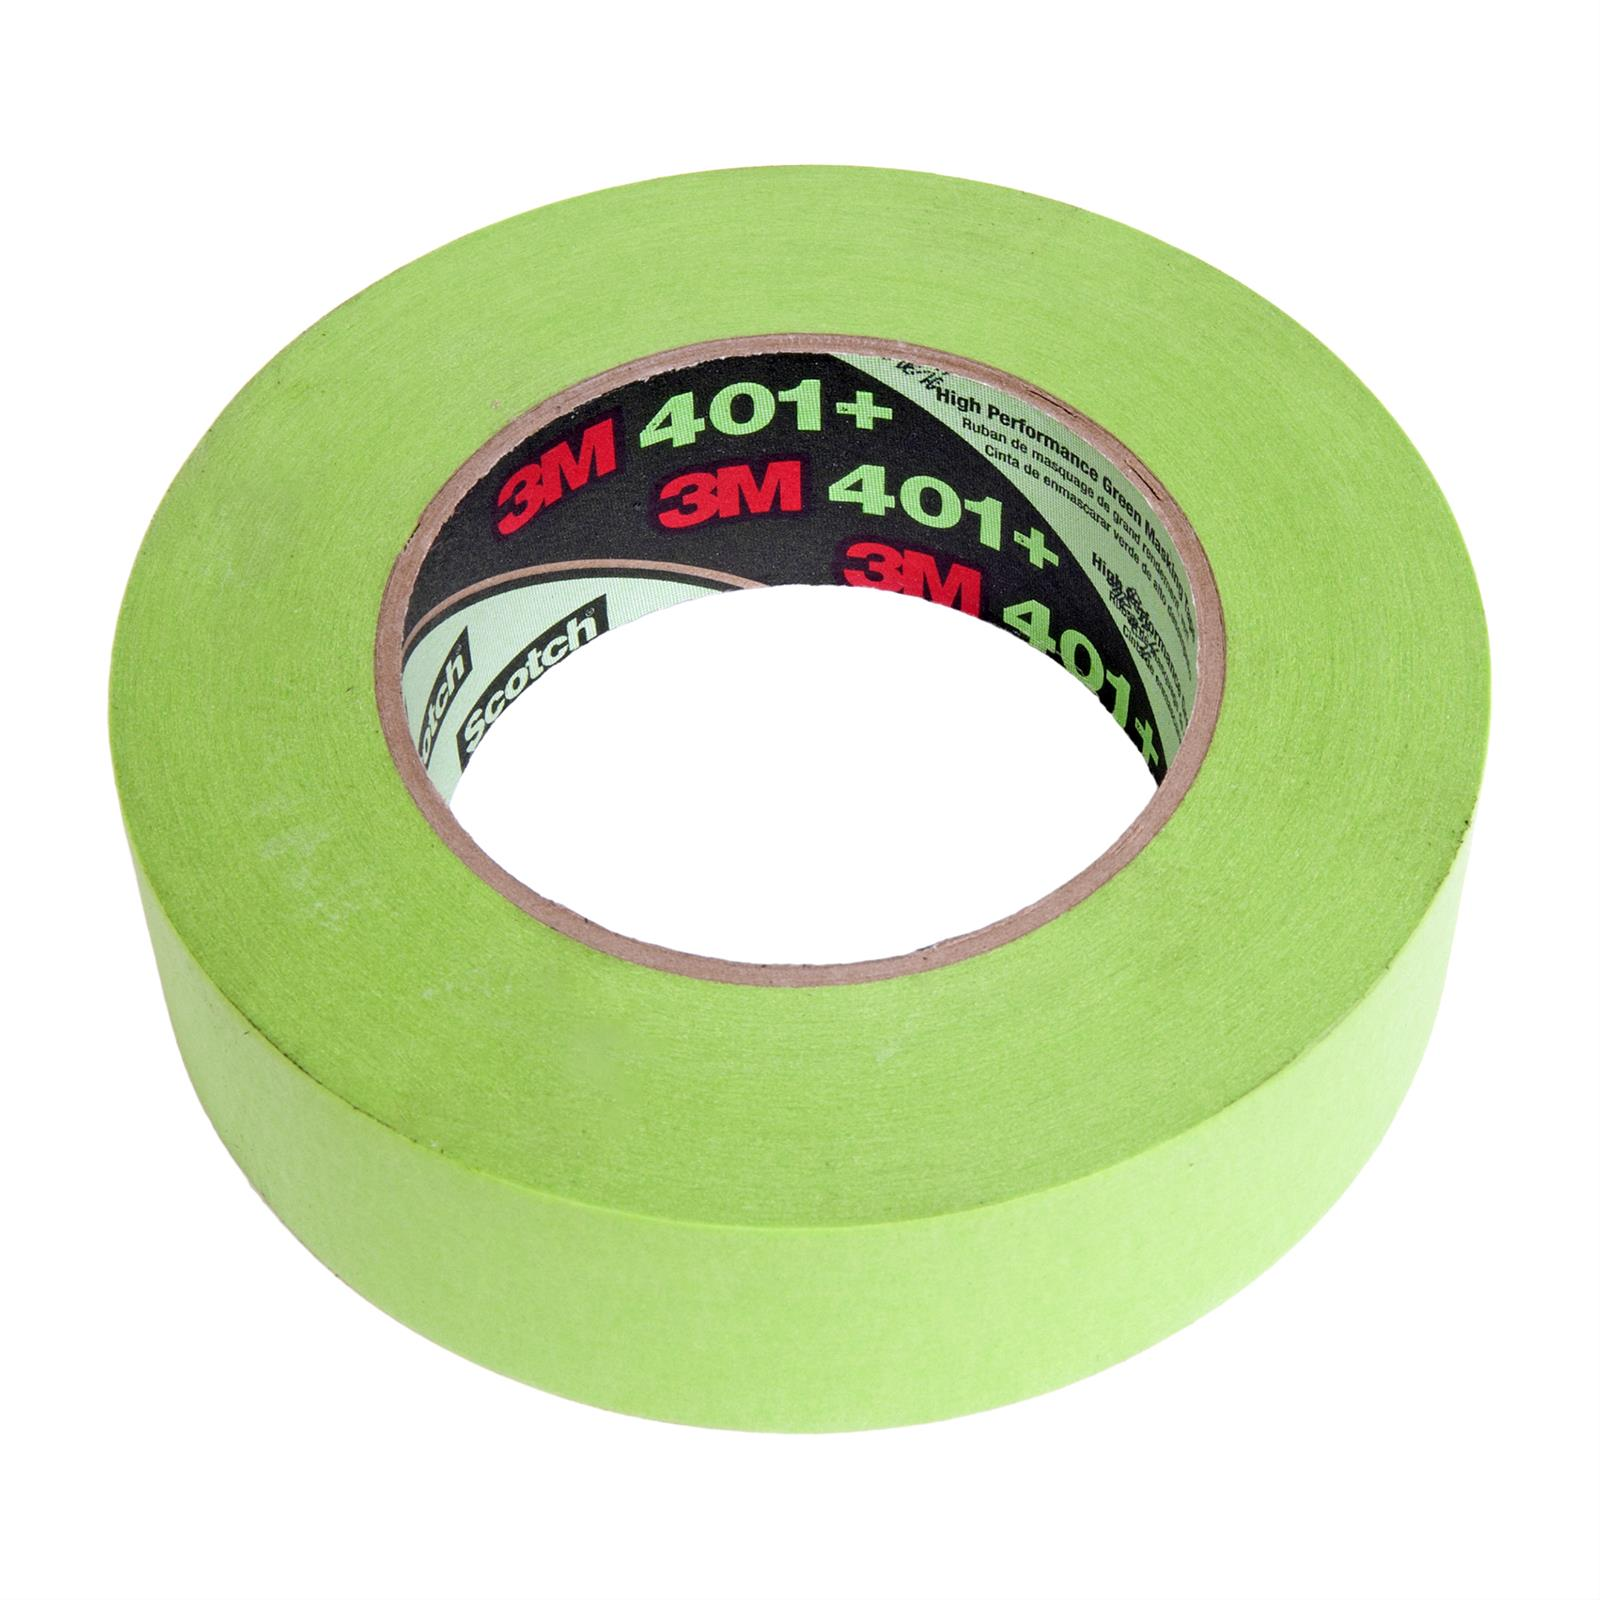 3m 401 green masking/painter's tape